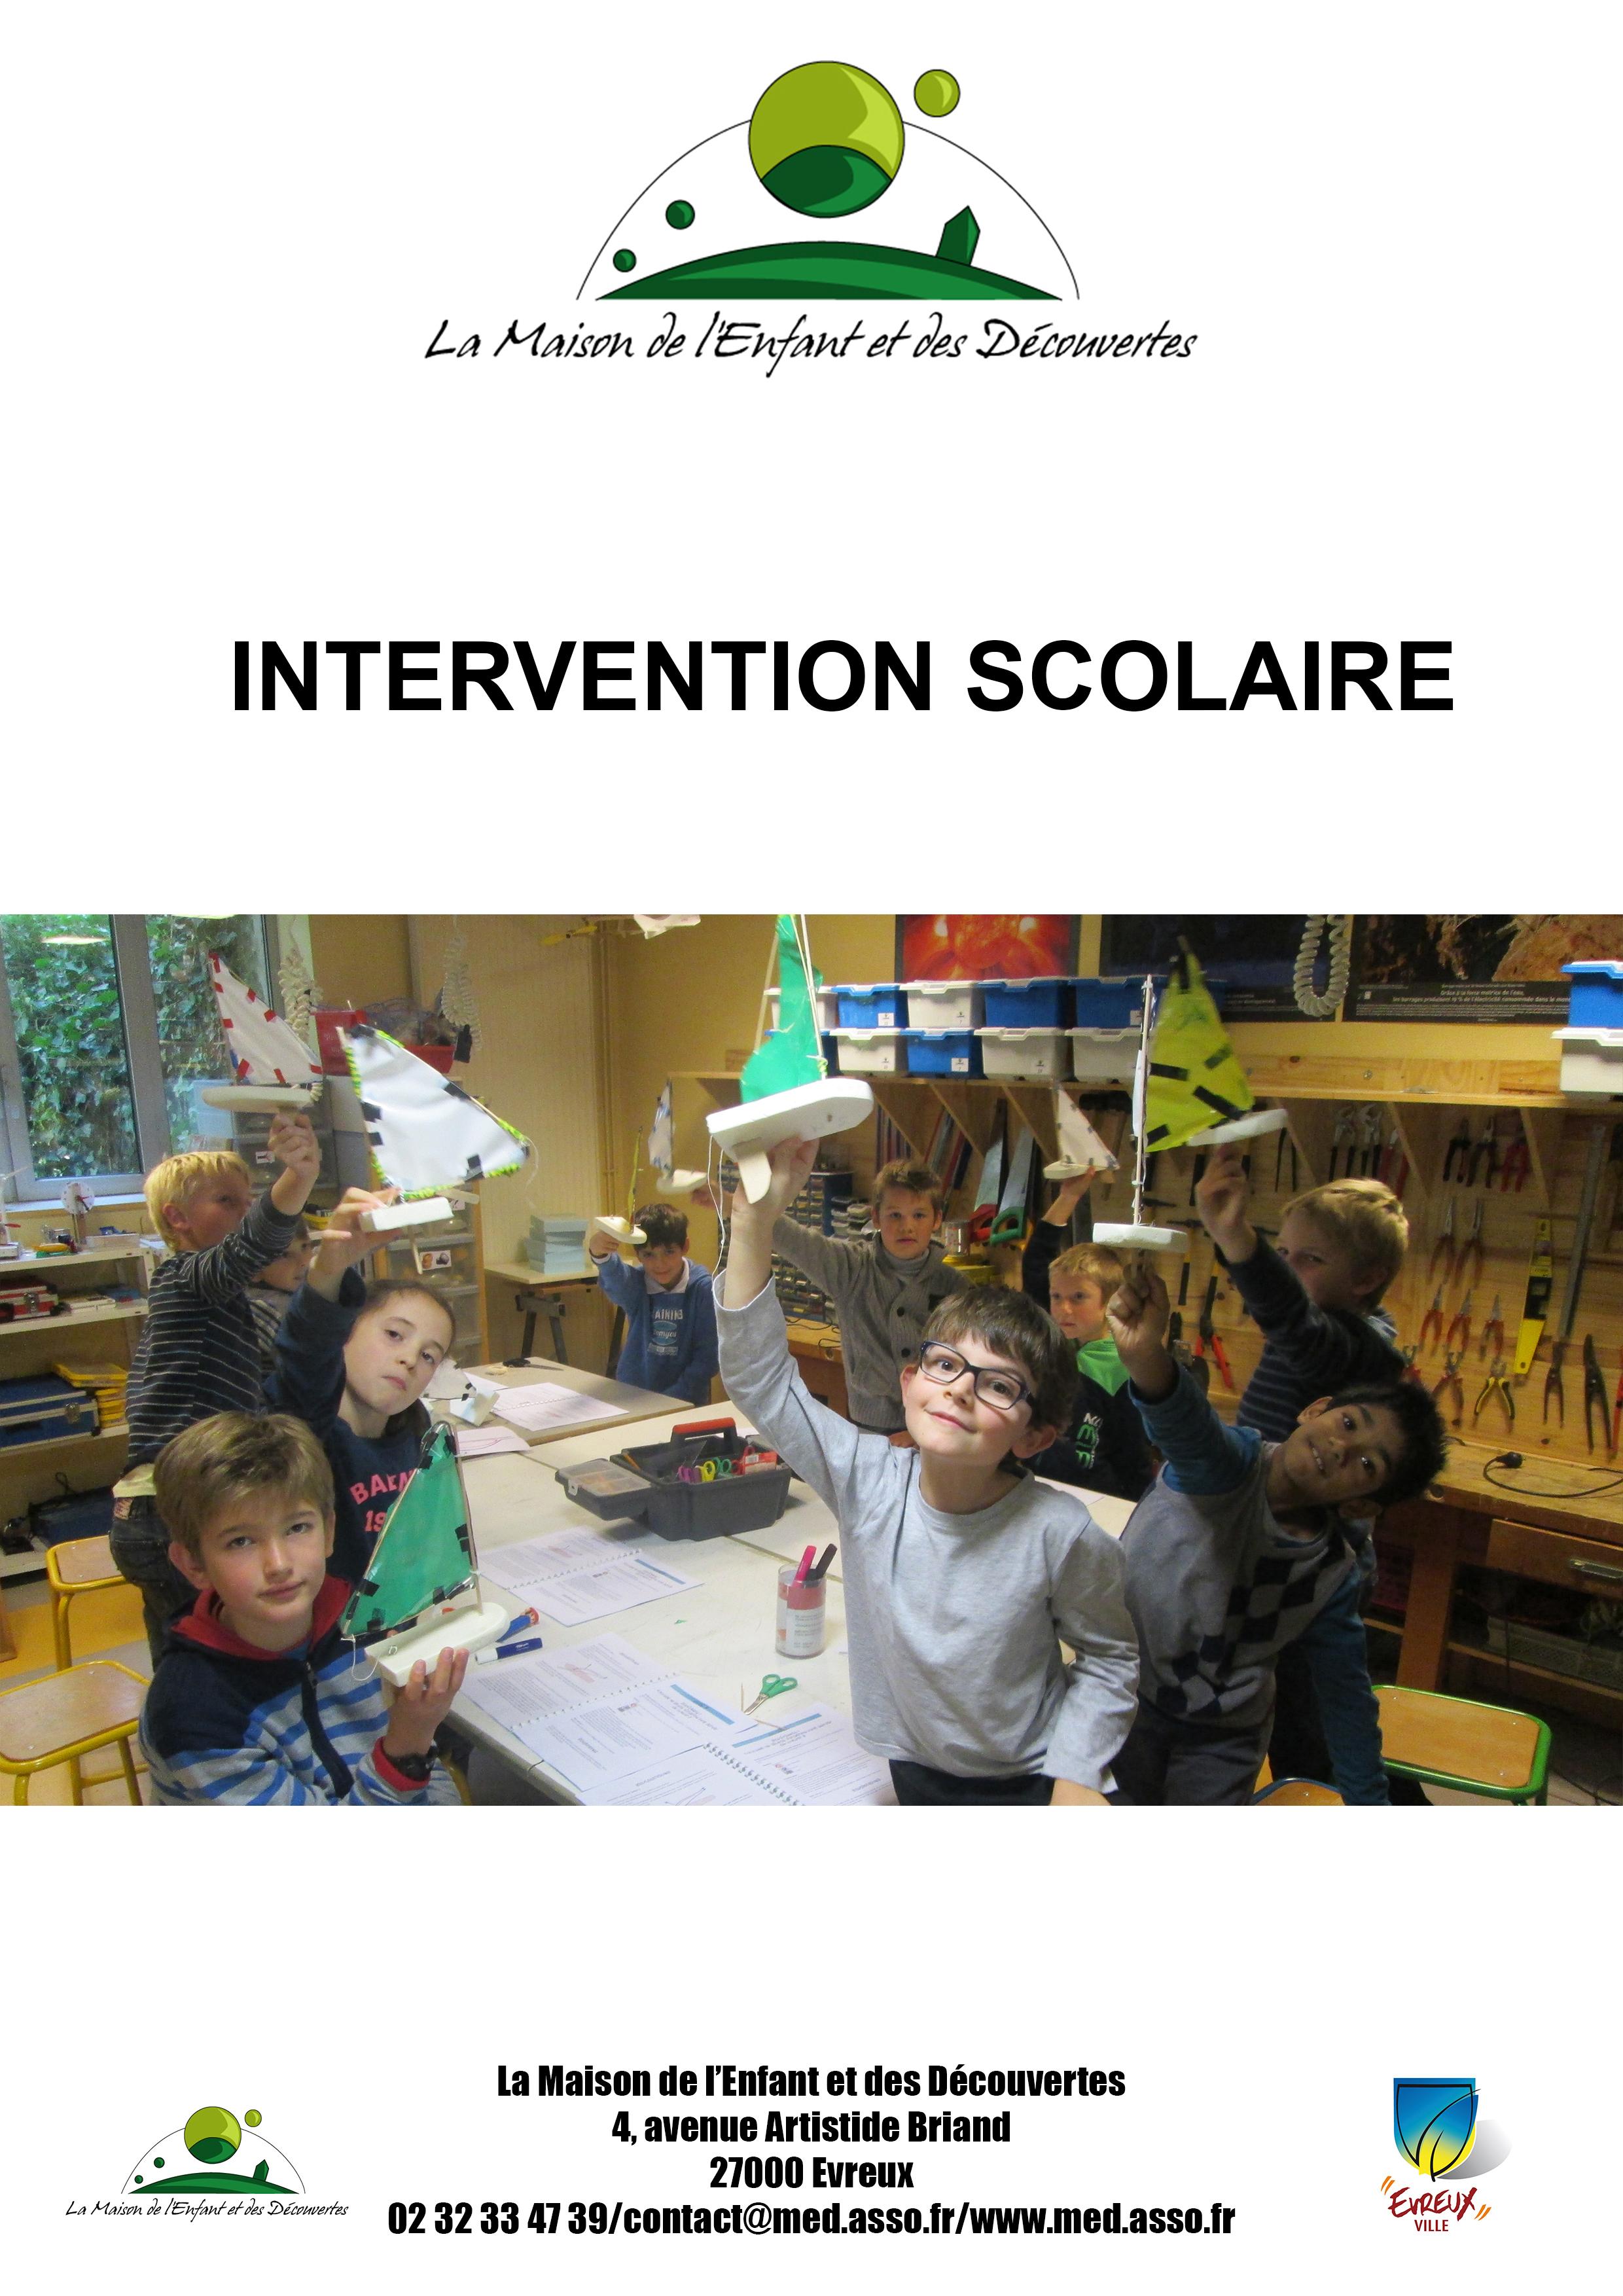 Intervention Scolaire